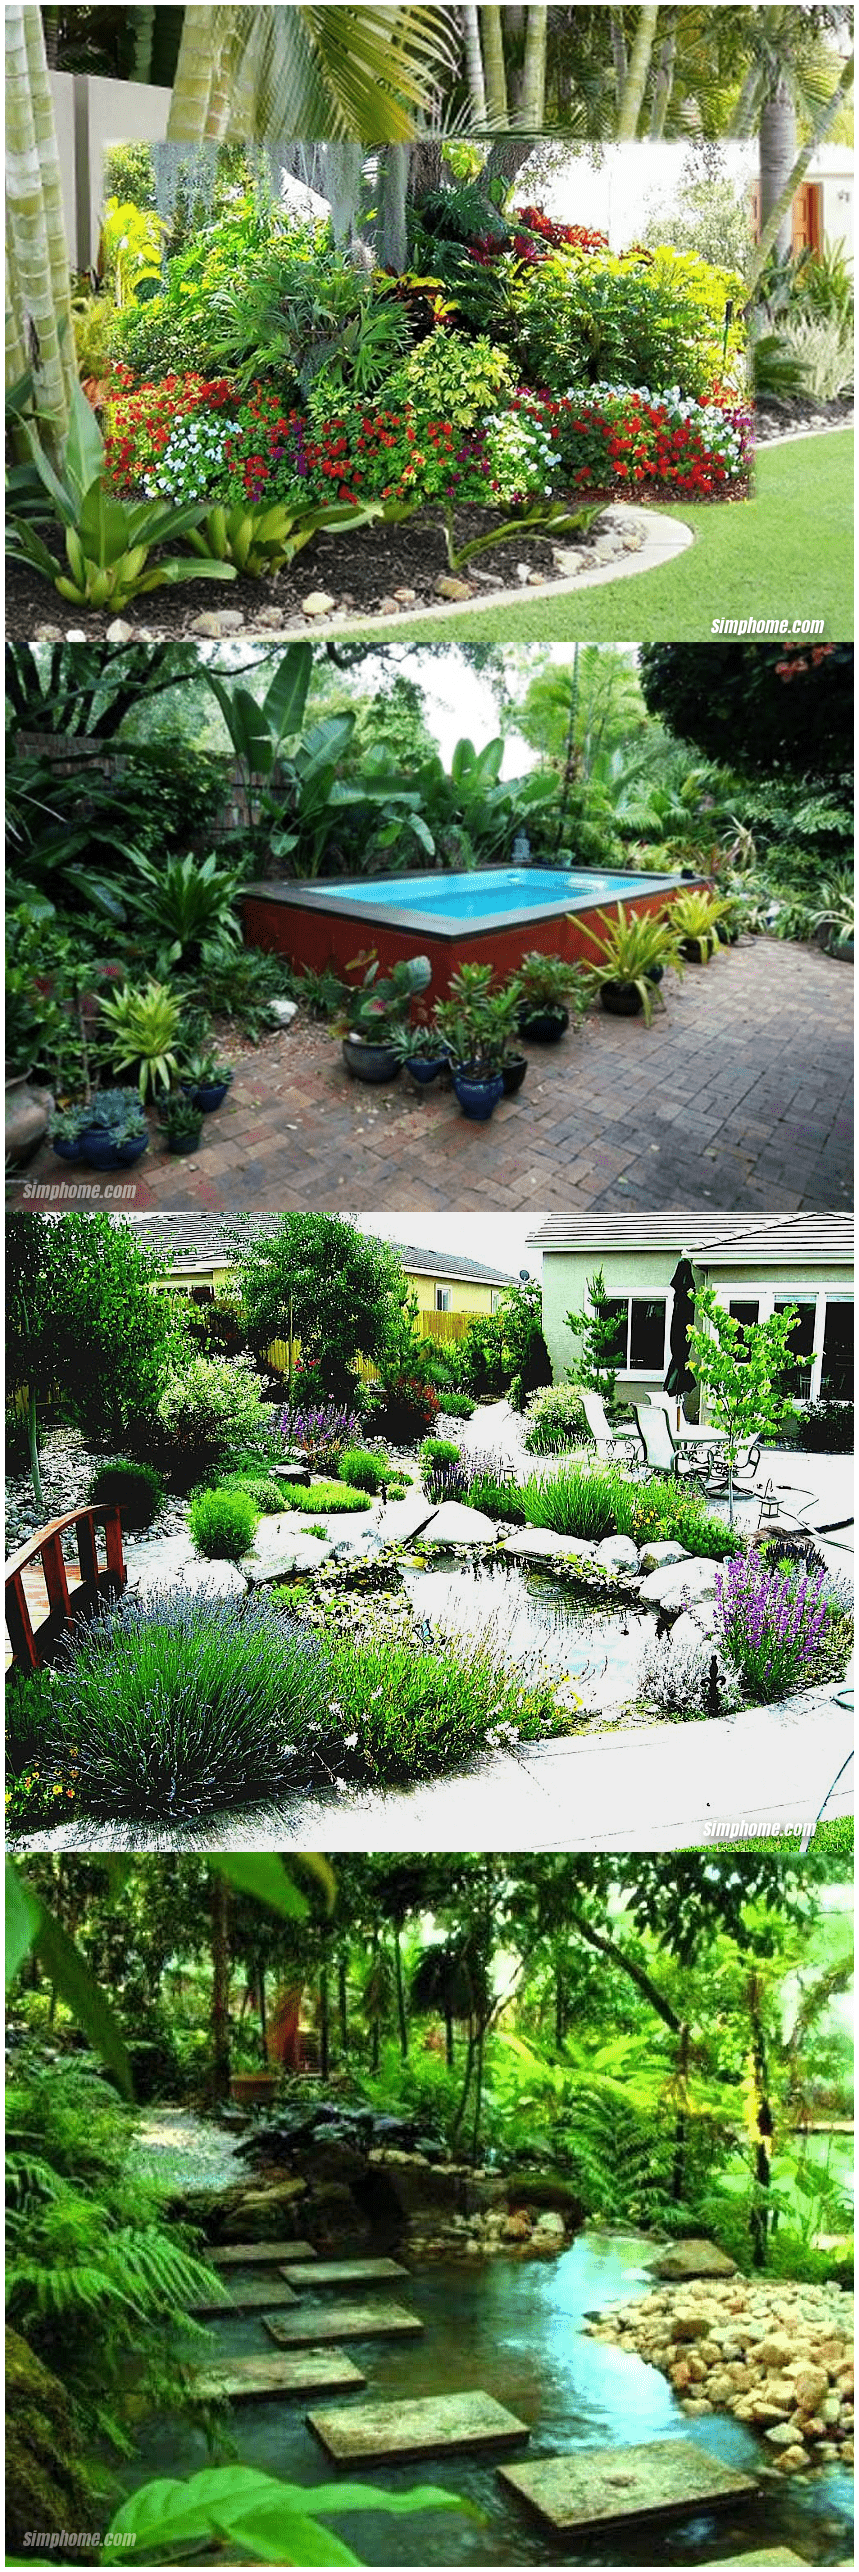 15.SIMPHOME.COM 10 Awesome Ideas How to Make Small Tropical Backyard Ideas